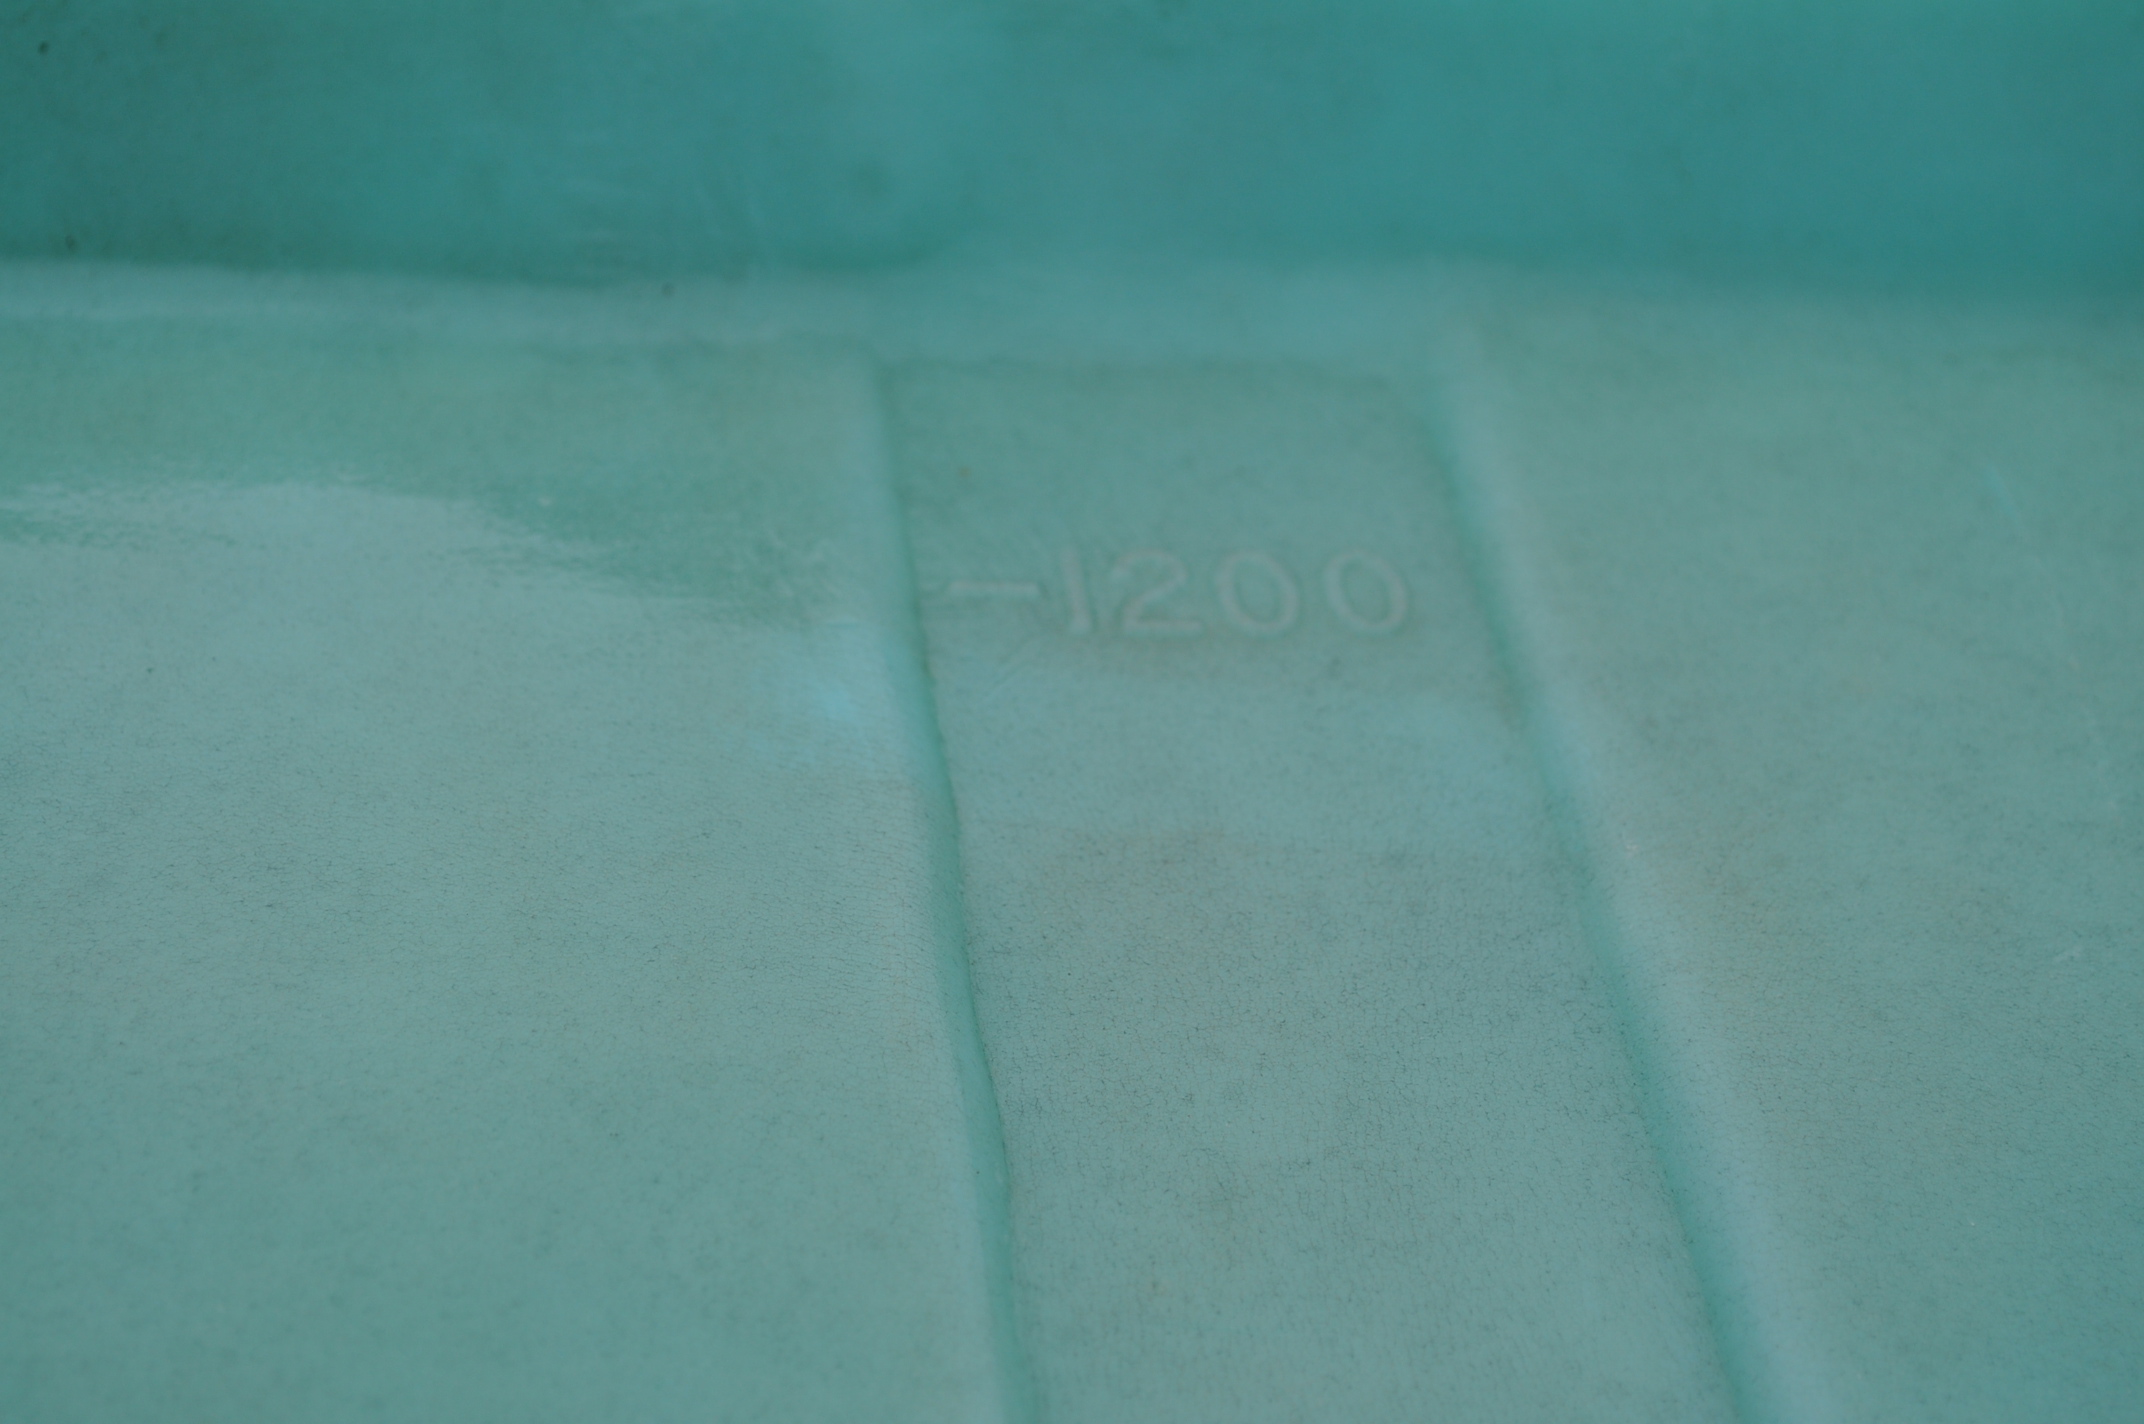 1200 gallon flat bottom poly tank - Image 5 of 5